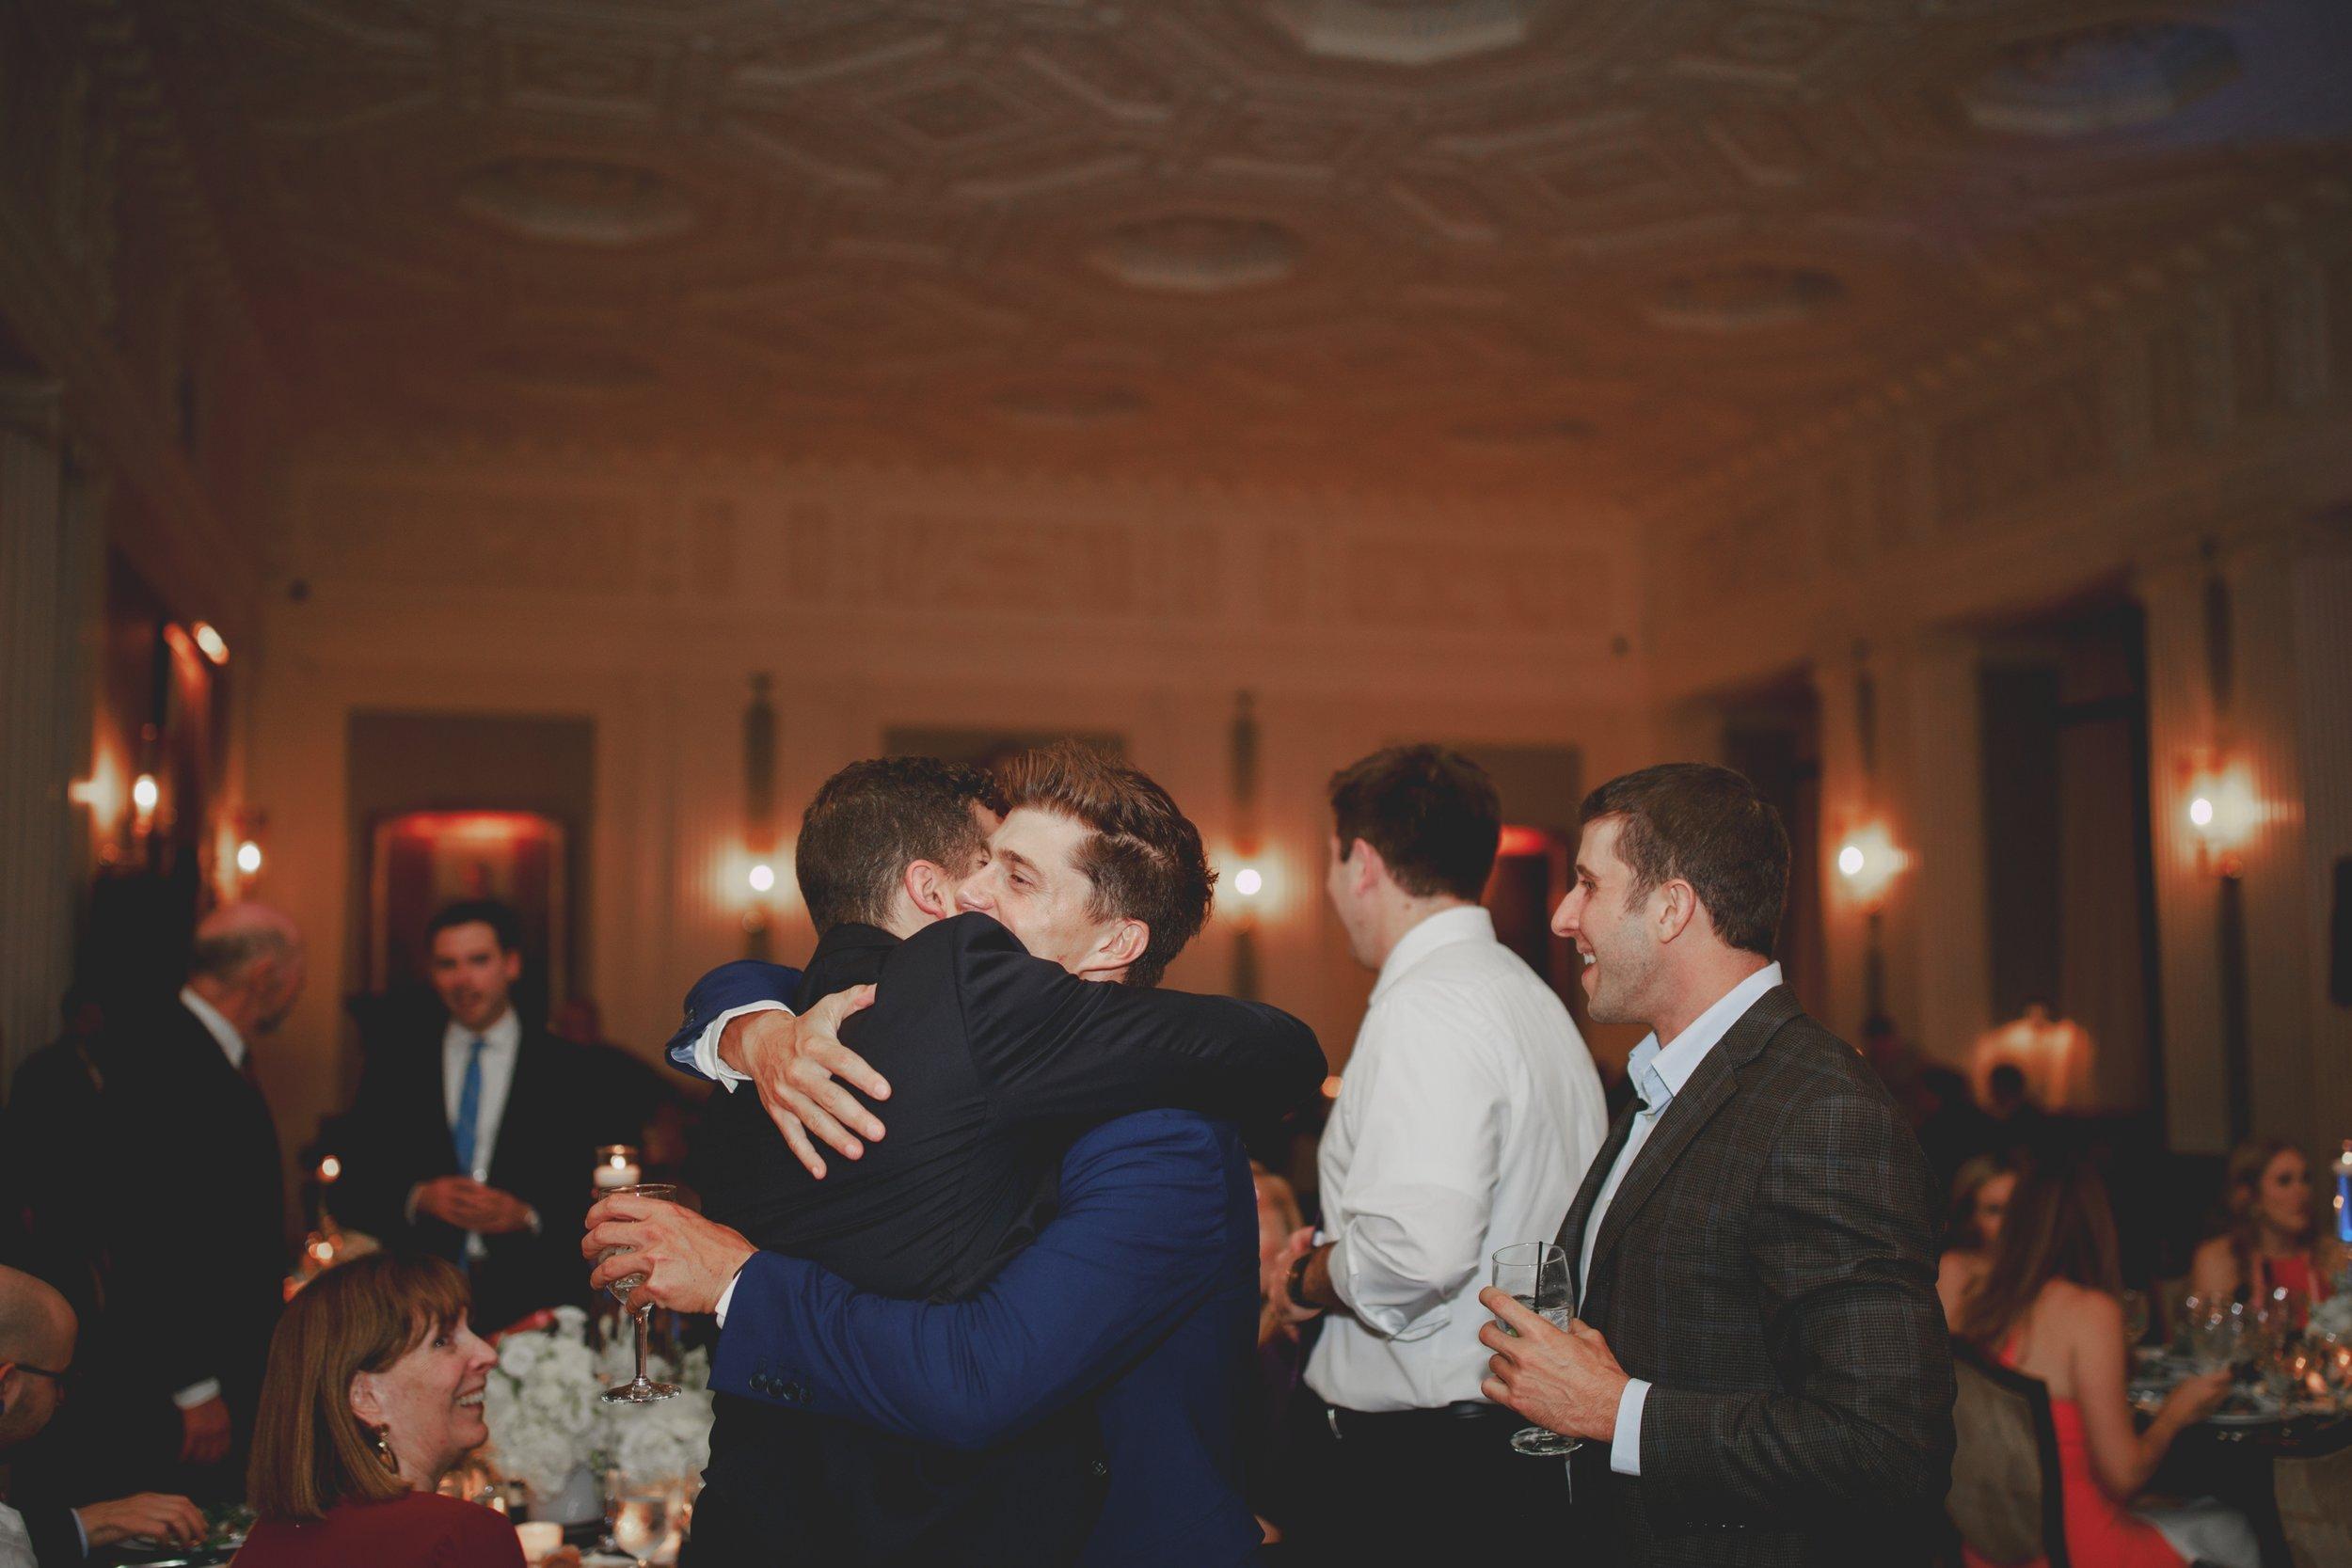 amanda_vanvels_new_york_lgbtq_gay_wedding_099.jpg